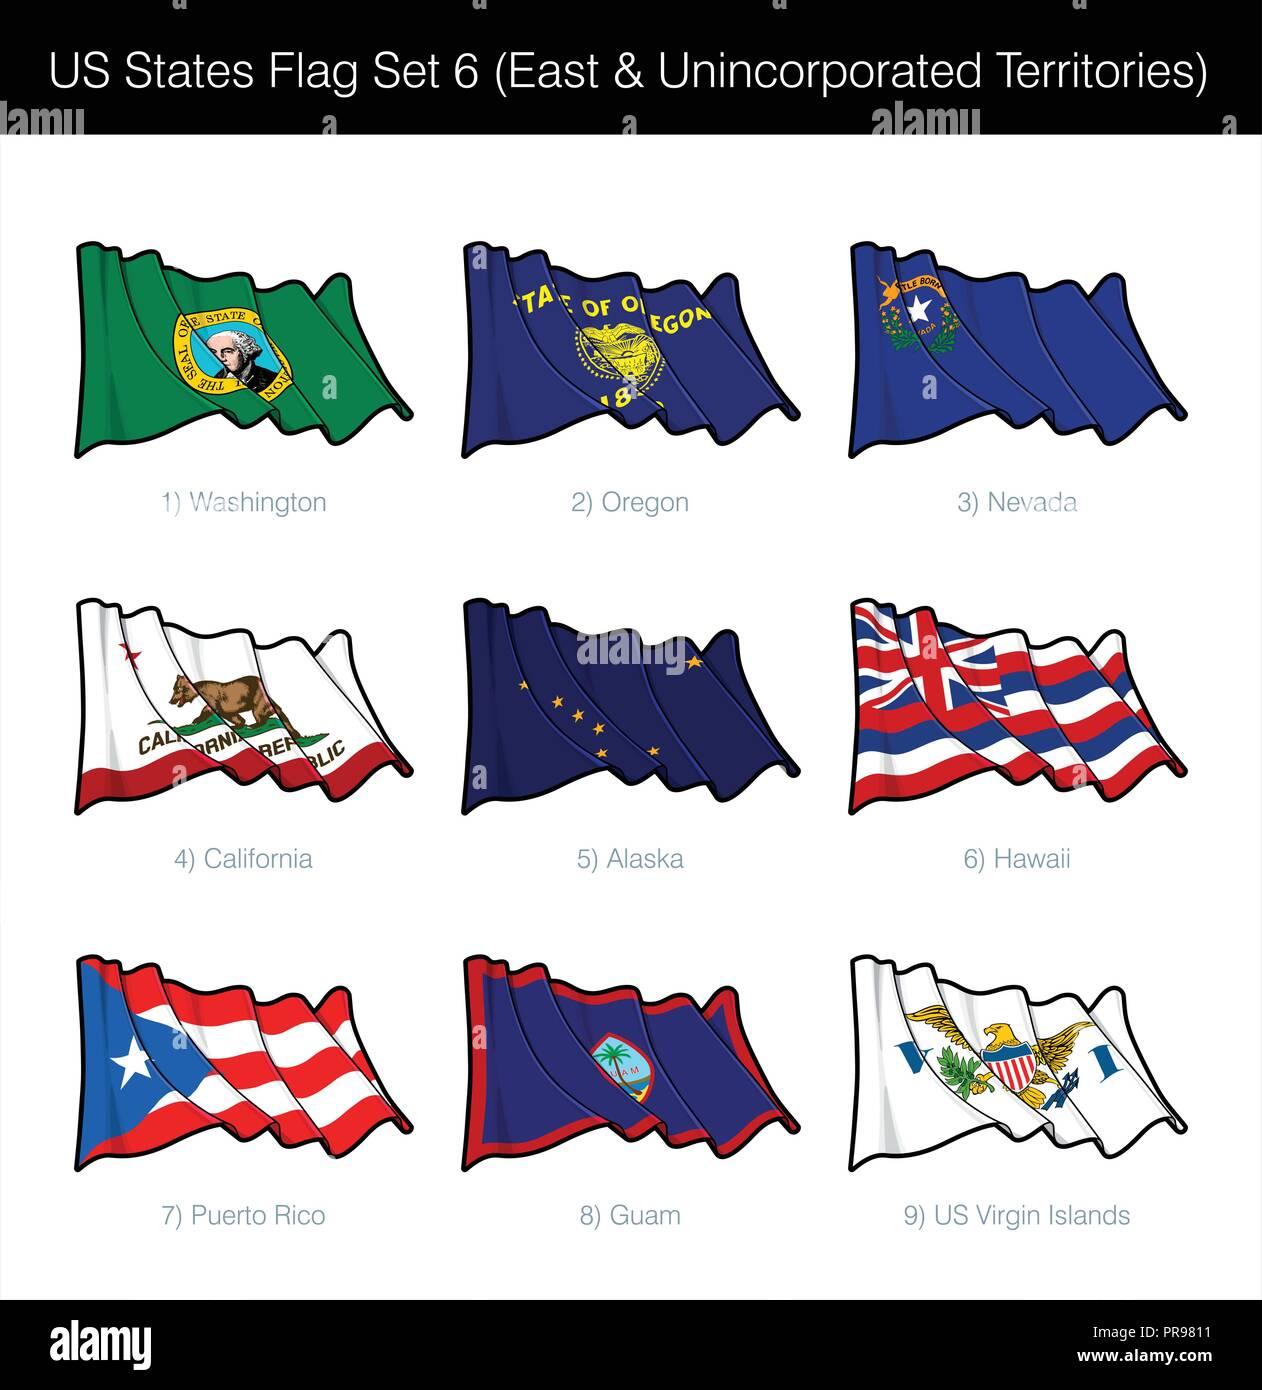 US States Flag Set - East States, Free Associated and Unincorporated Territories. Washington State, Oregon, Nevada, California, Alaska, Hawaii, Puerto - Stock Vector